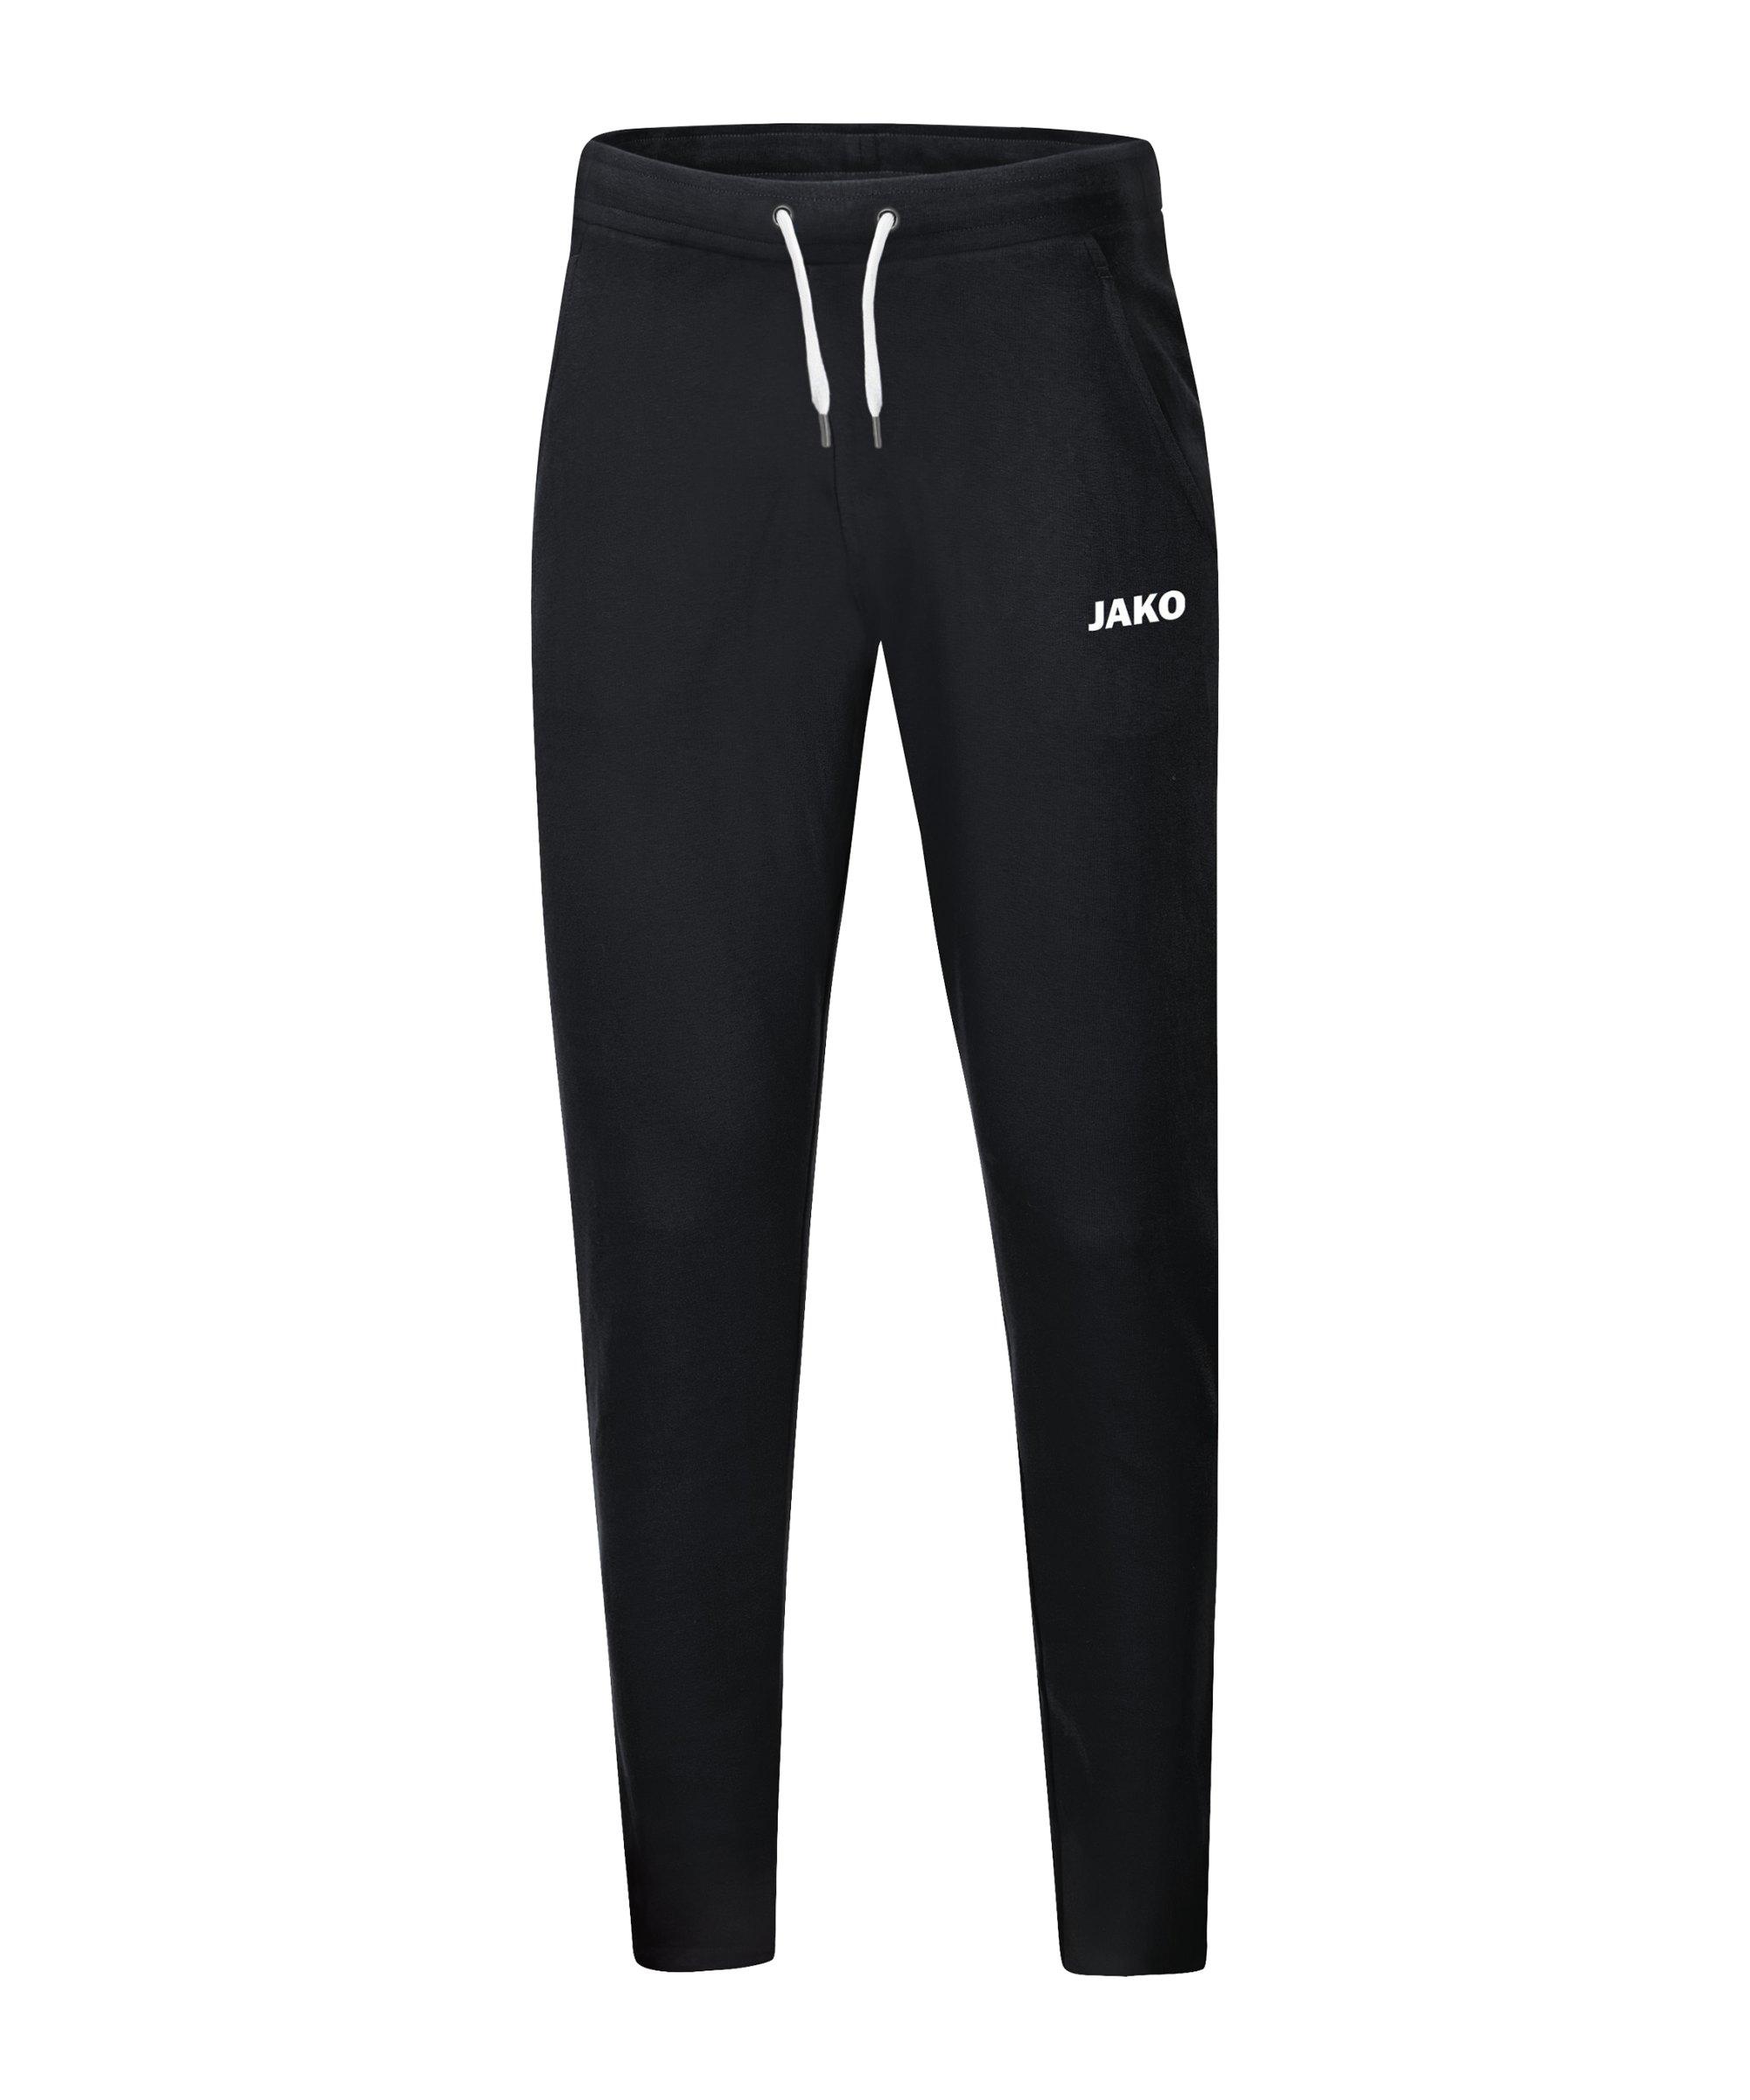 JAKO Base Jogginghose Damen Schwarz F08 - schwarz